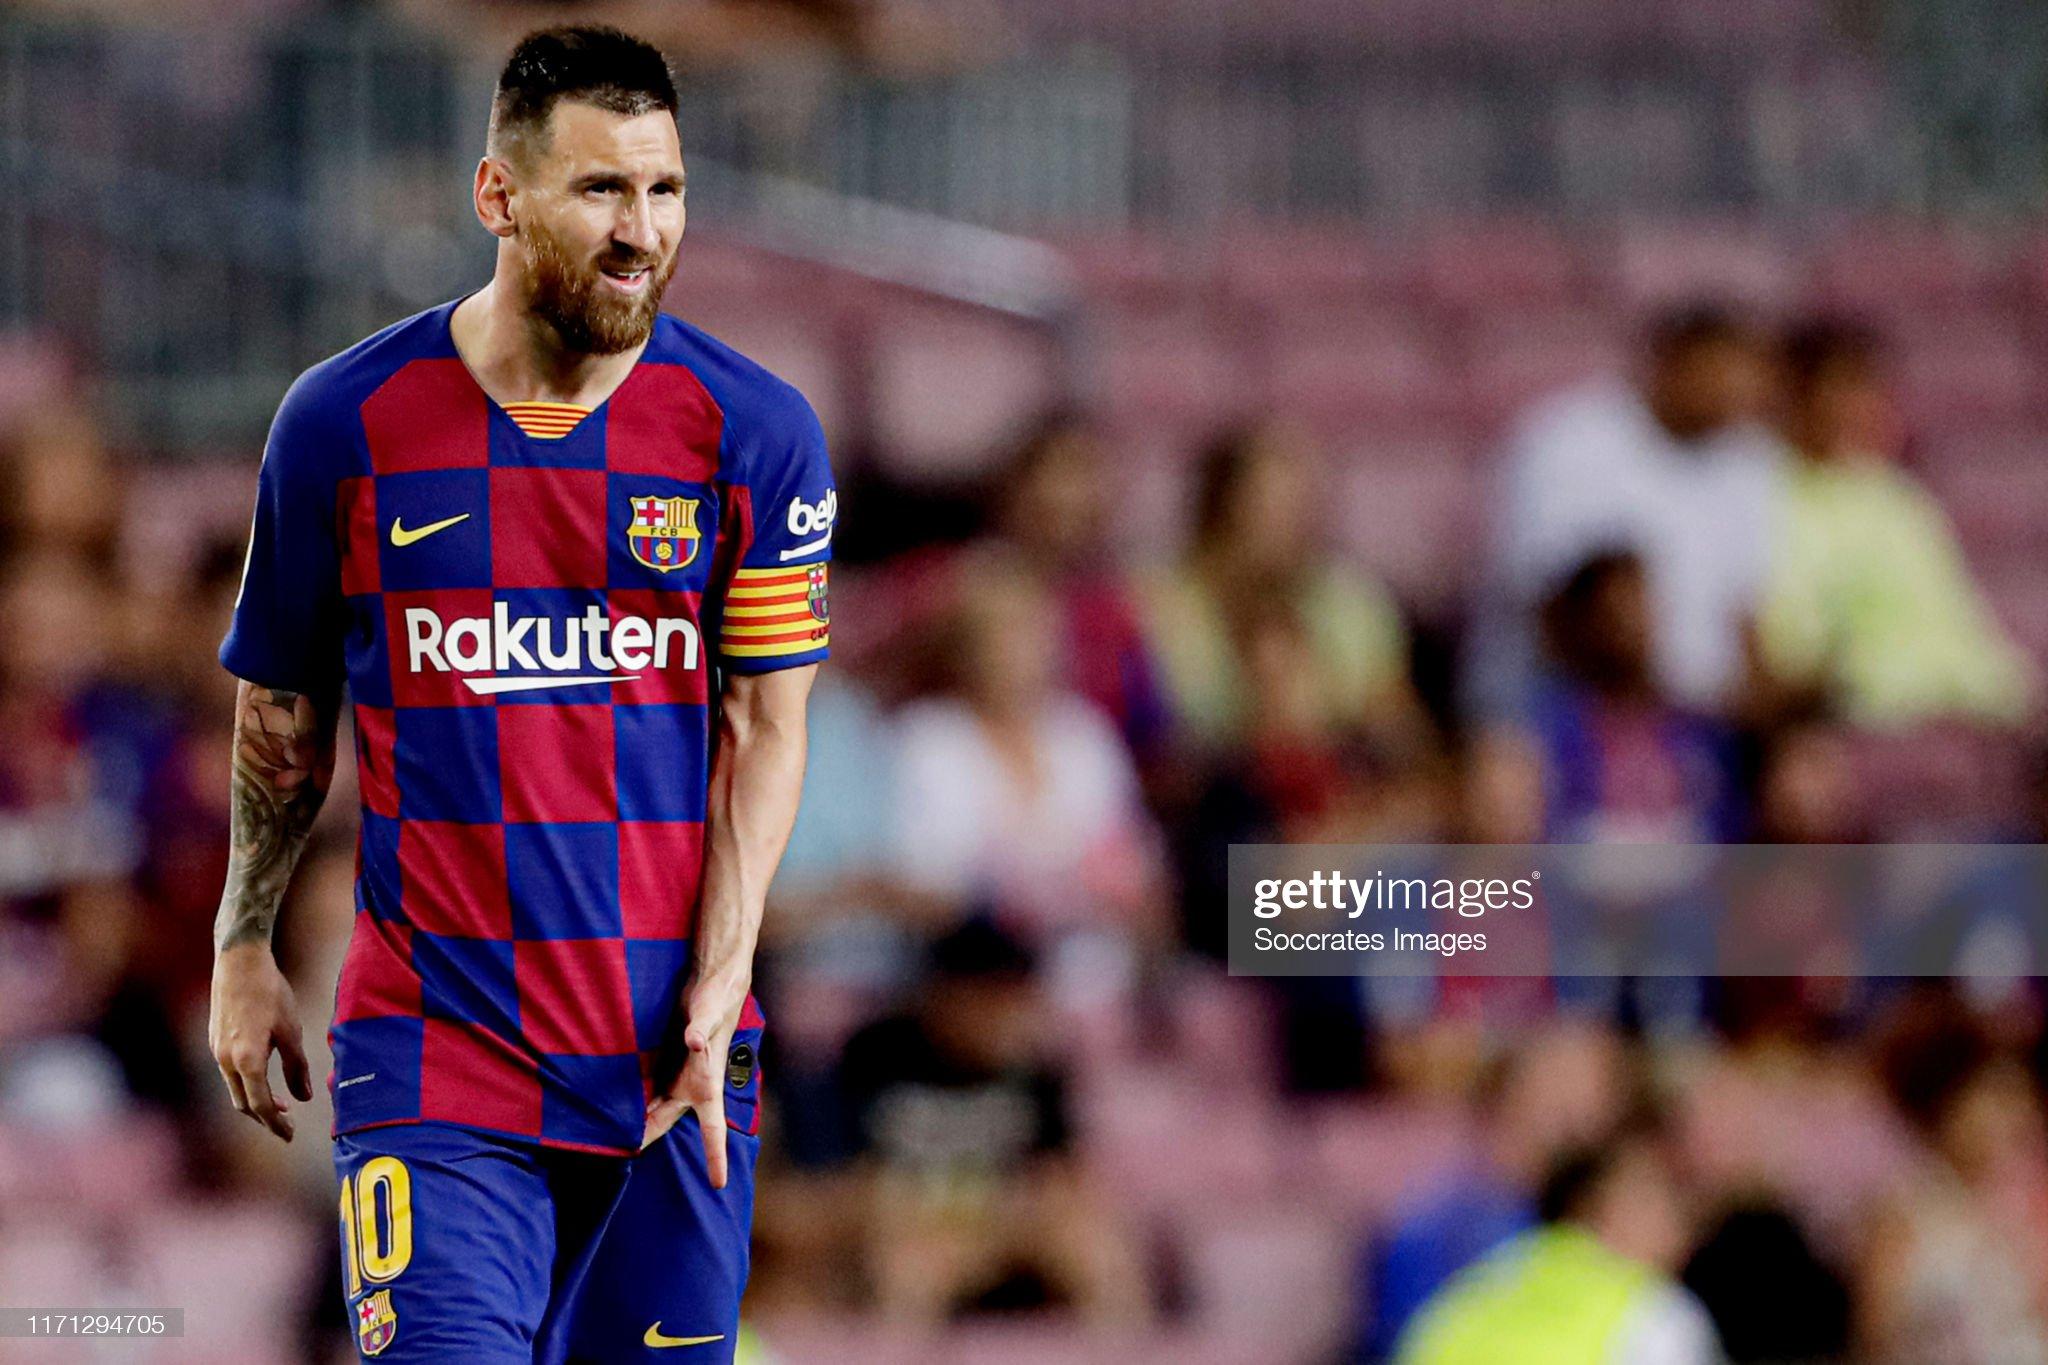 صور مباراة : برشلونة - فياريال 2-1 ( 24-09-2019 )  Lionel-messi-of-fc-barcelona-during-the-la-liga-santander-match-fc-picture-id1171294705?s=2048x2048